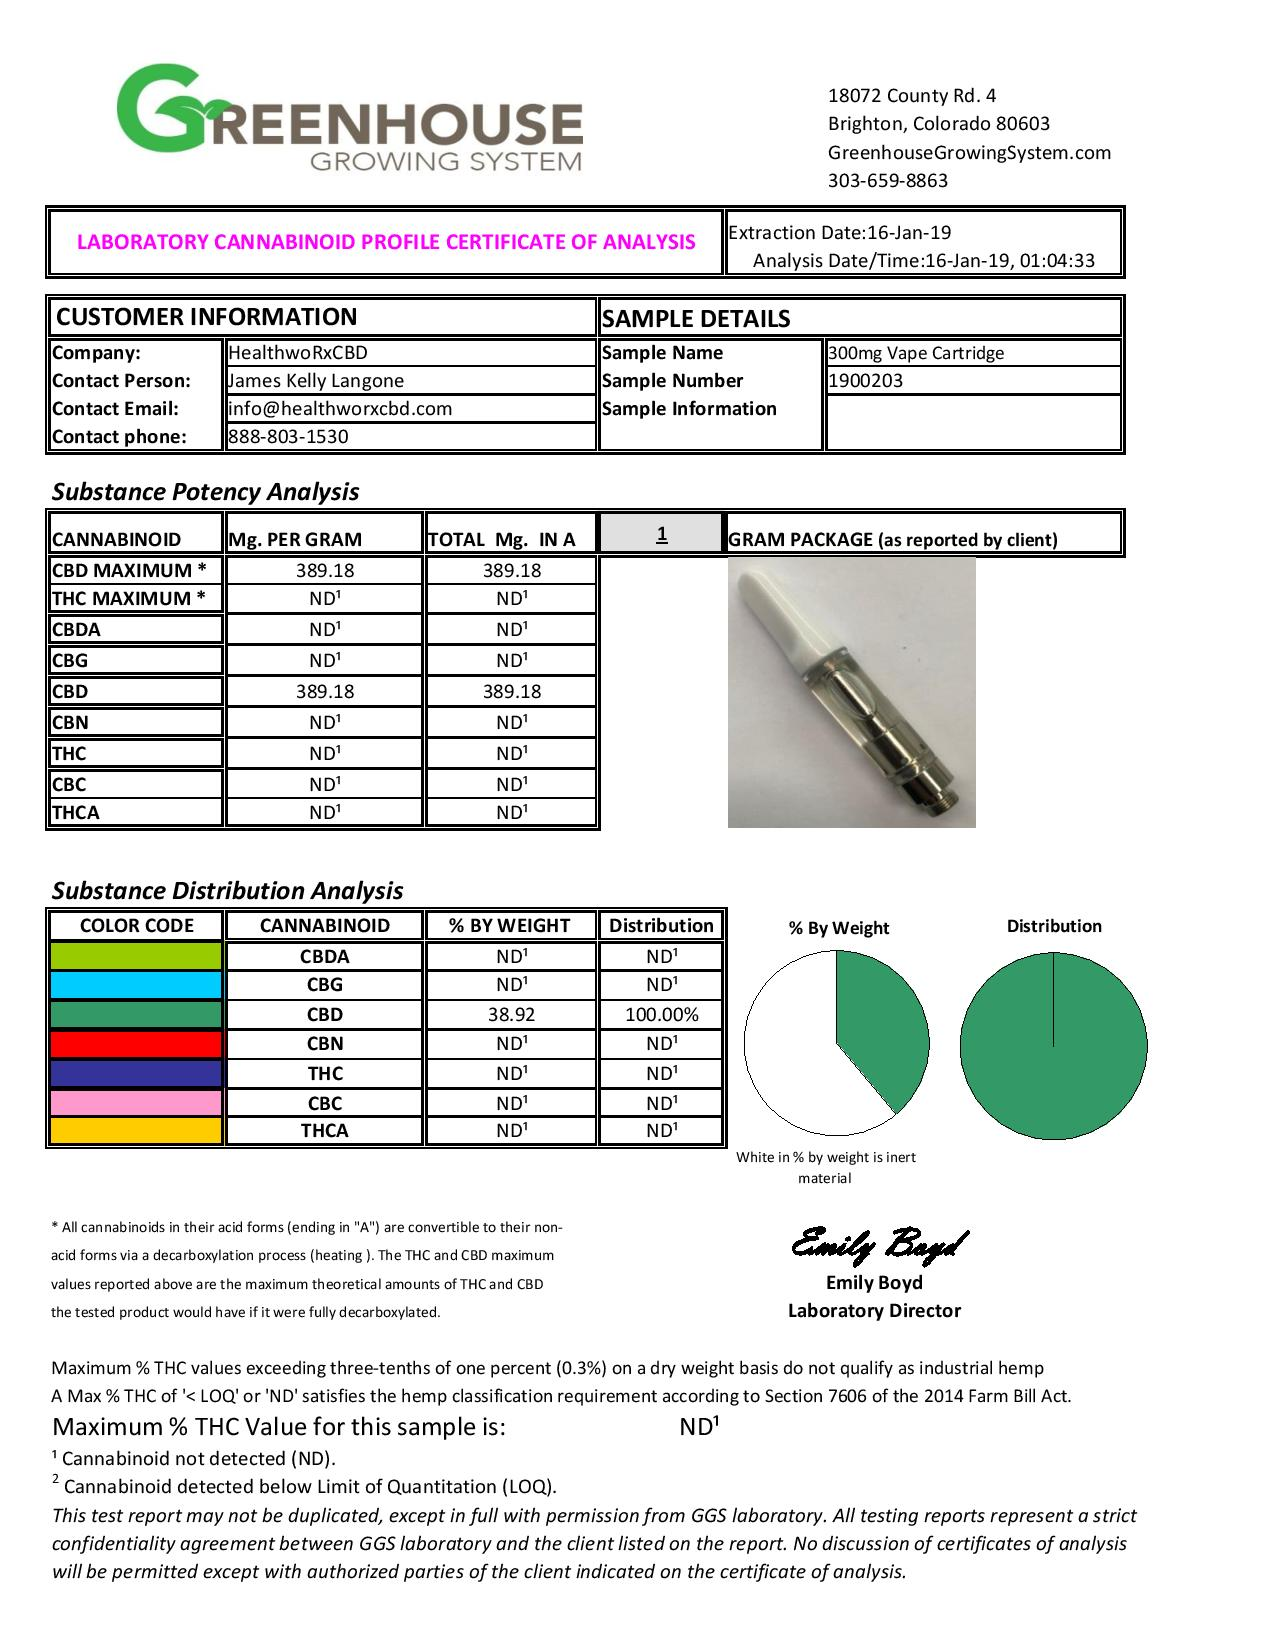 300mg Full Spectrum Indica Blend CBD Vape Cartridge - Indica CBD